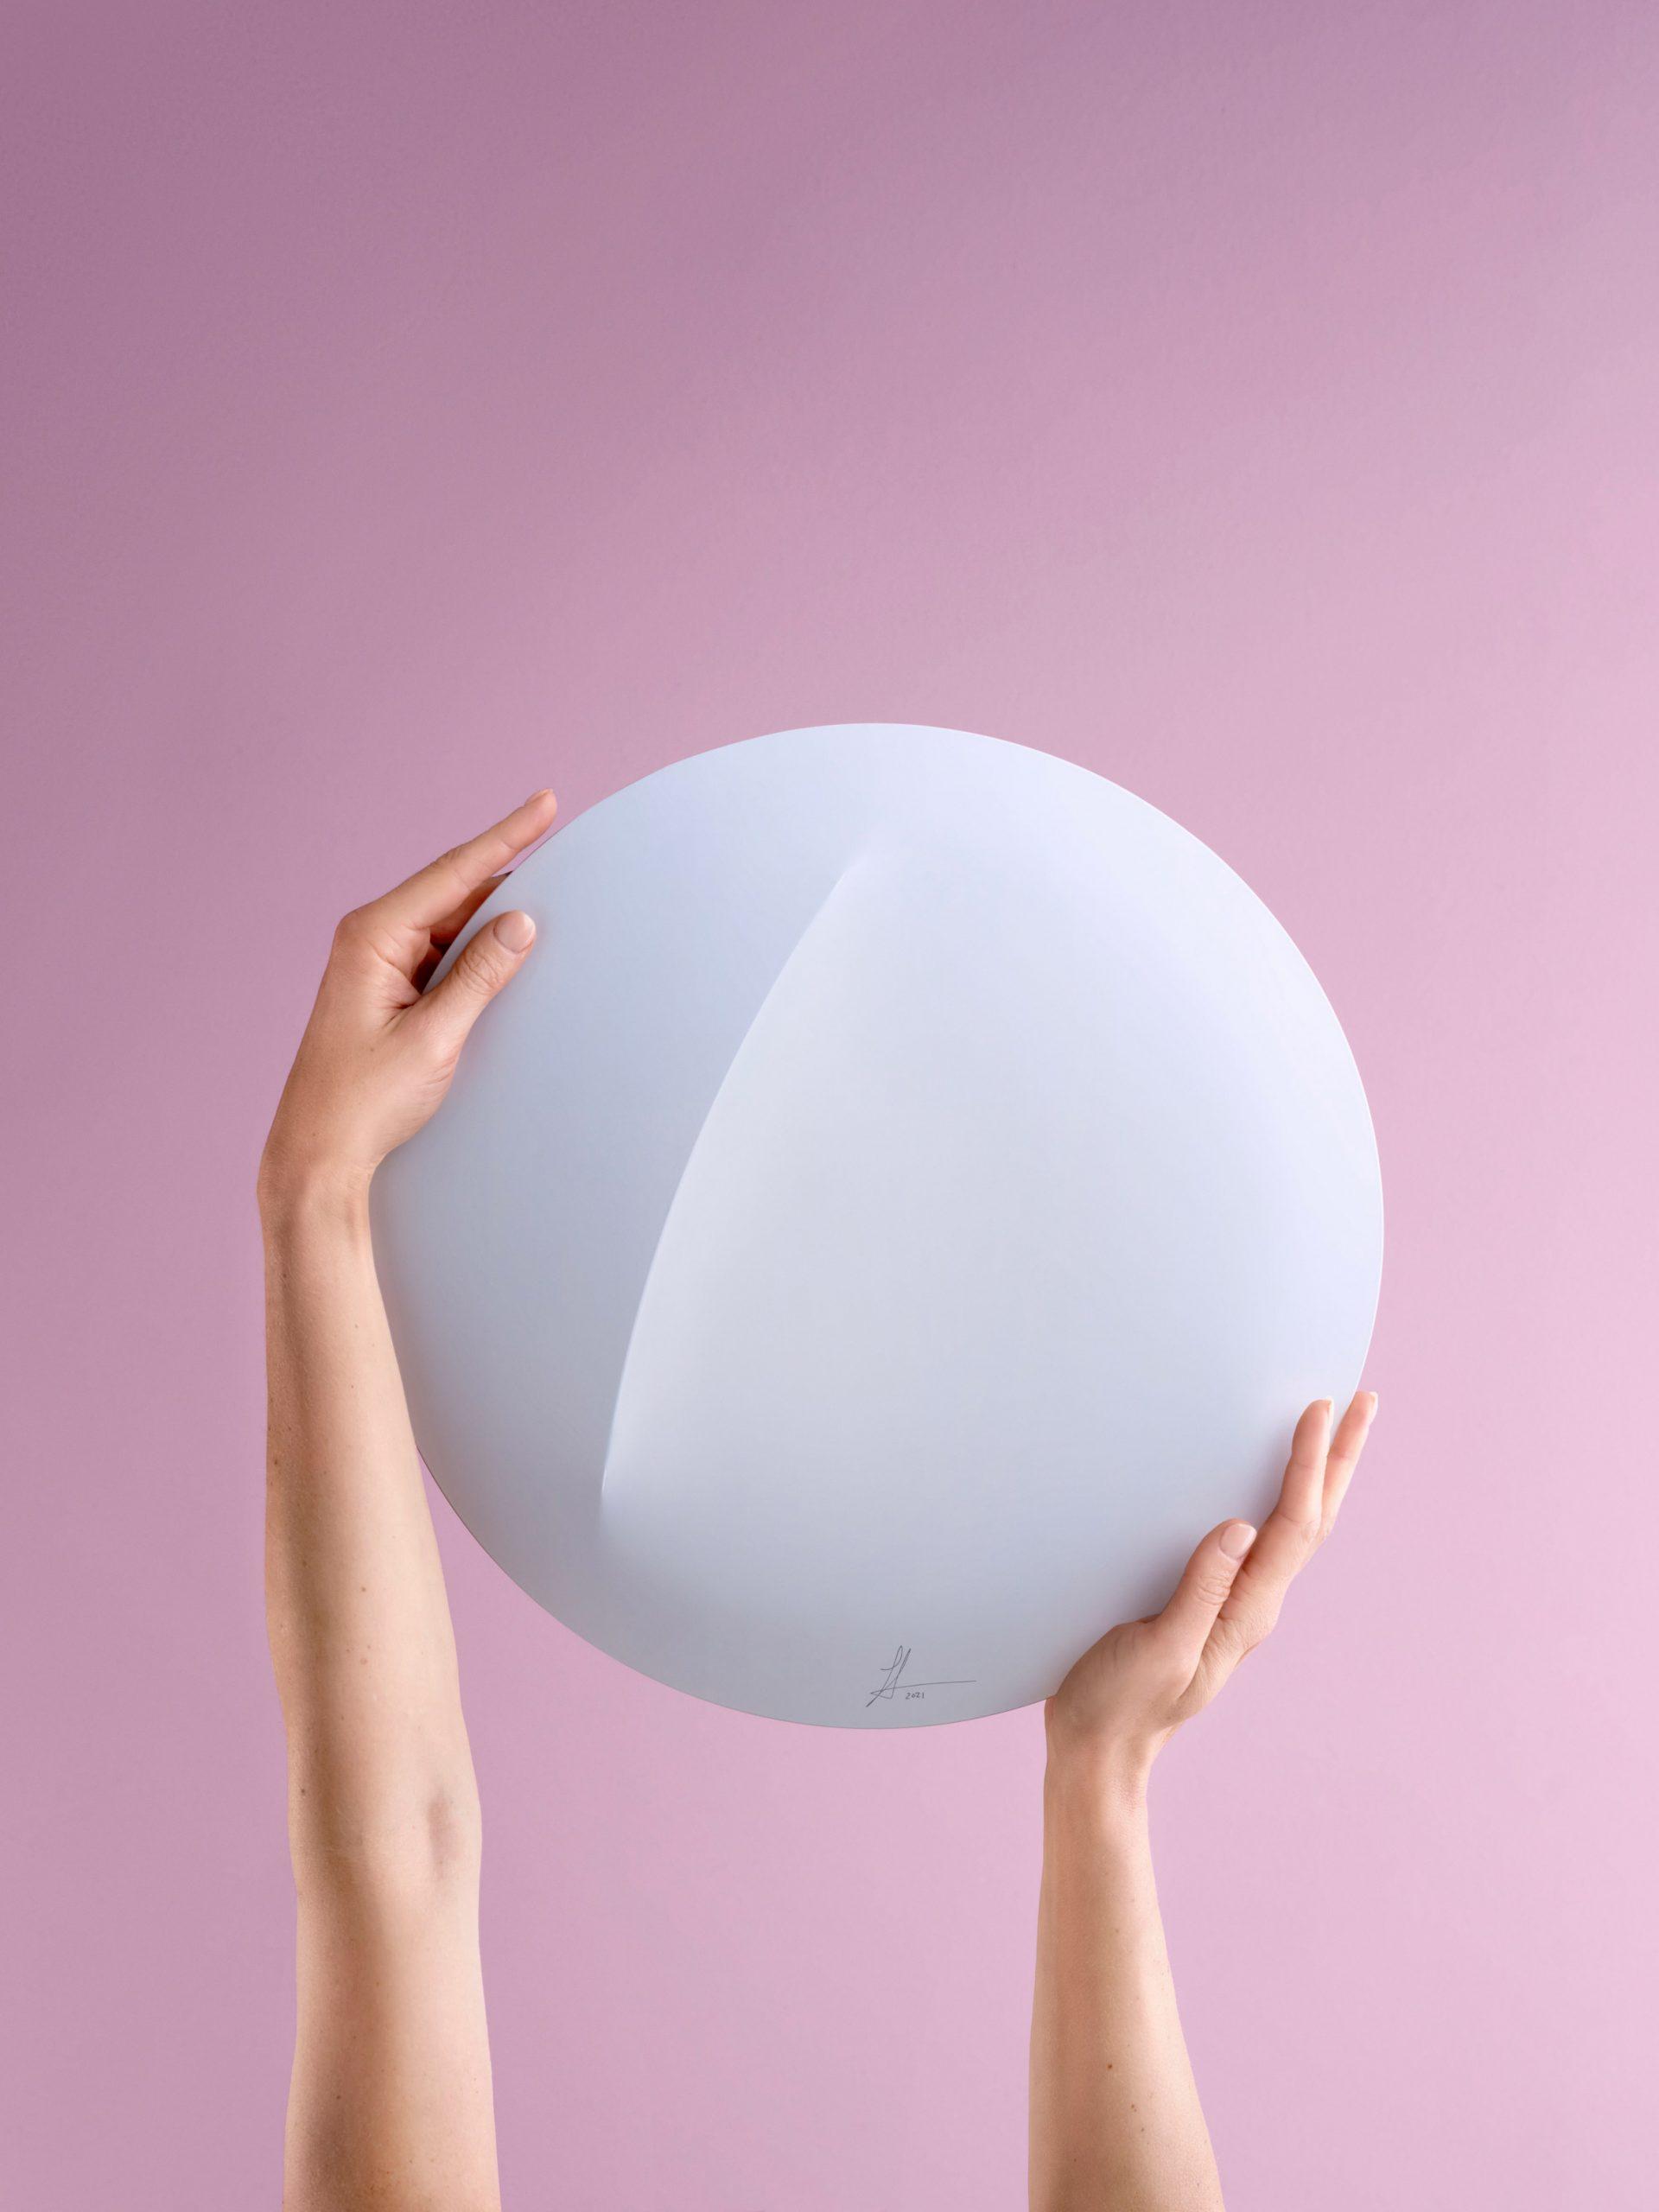 Sabine Marcelis wall light for IKEA Art Event 2021